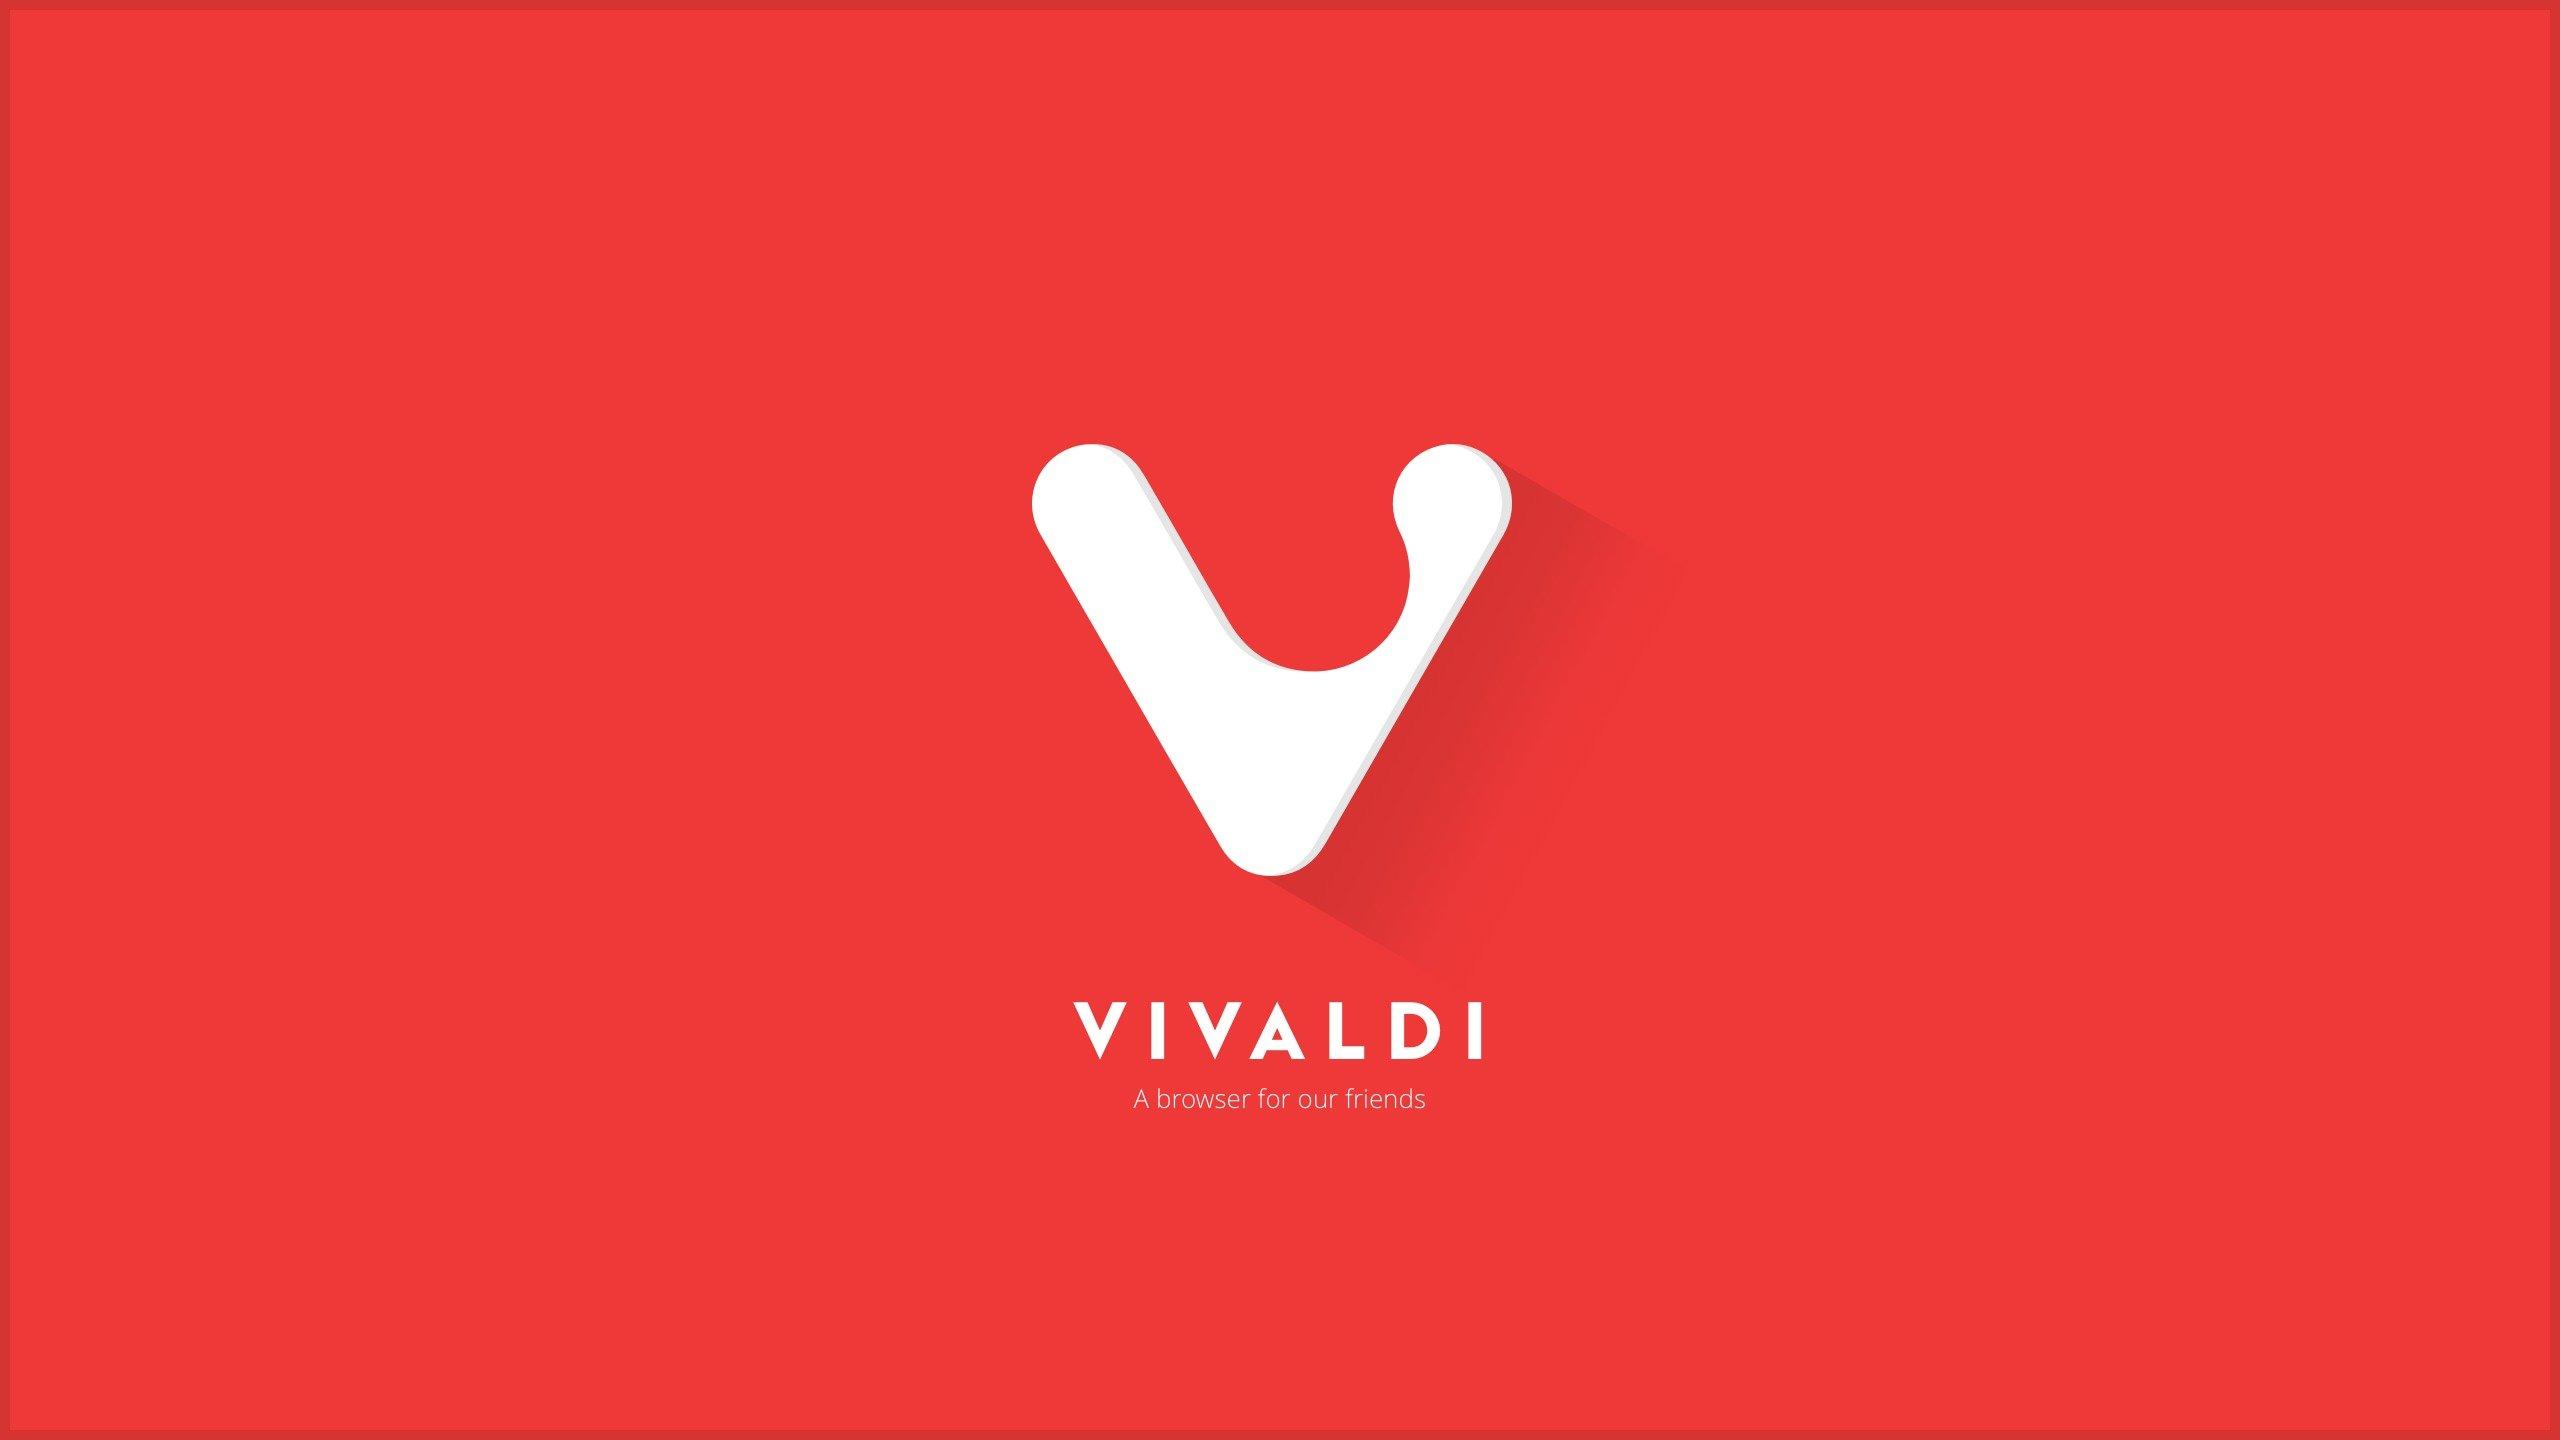 vivaldi 1.3 browser